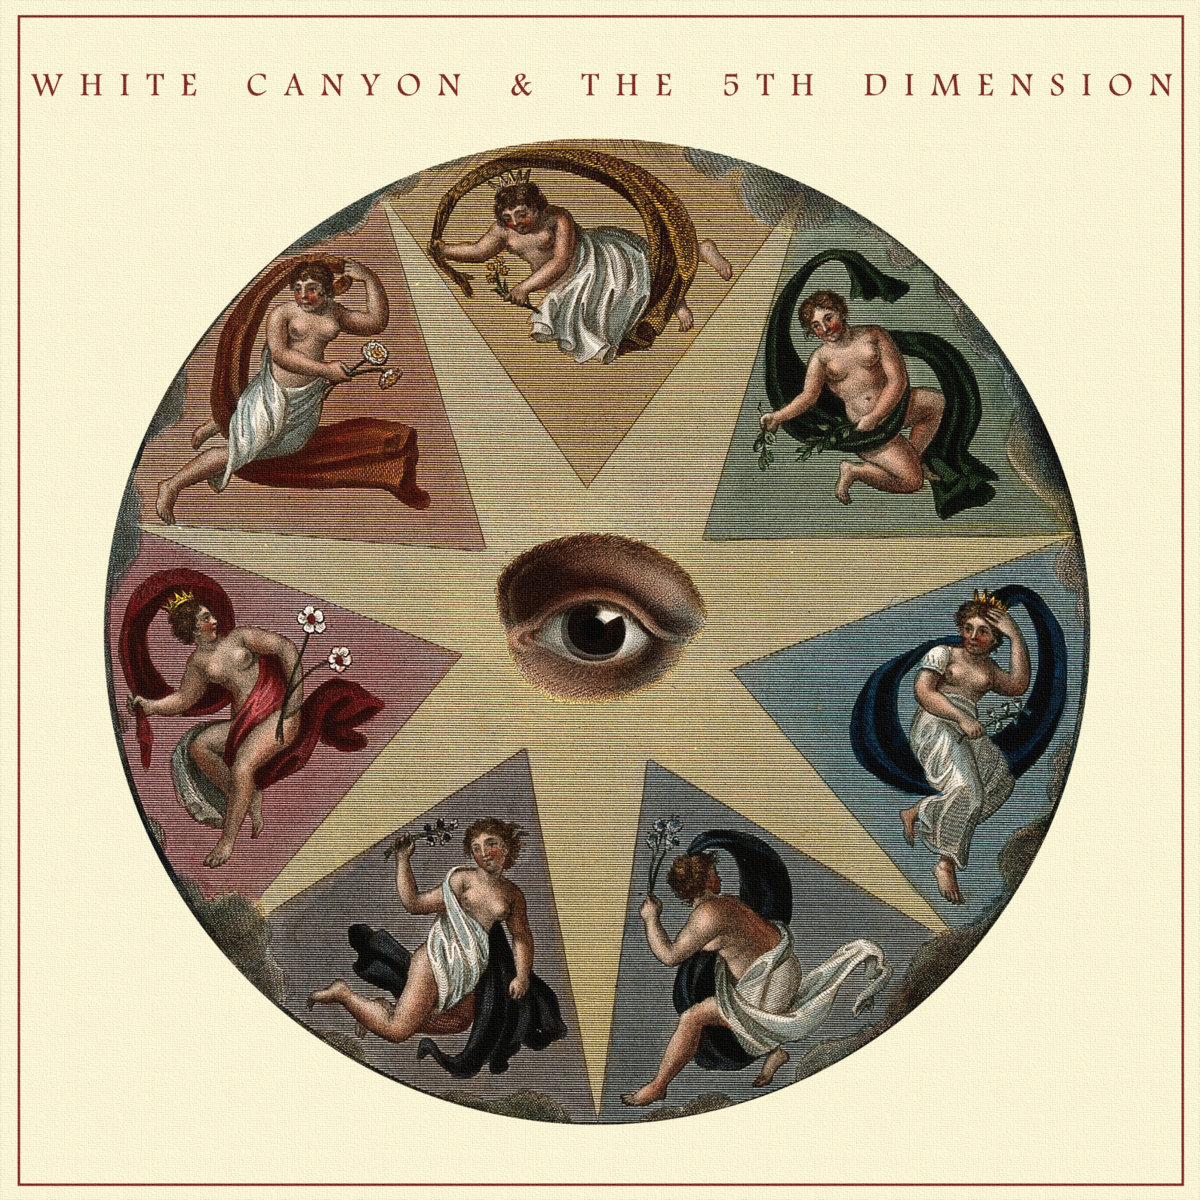 White Canyon & The 5th Dimension - White Canyon & The 5th Dimension